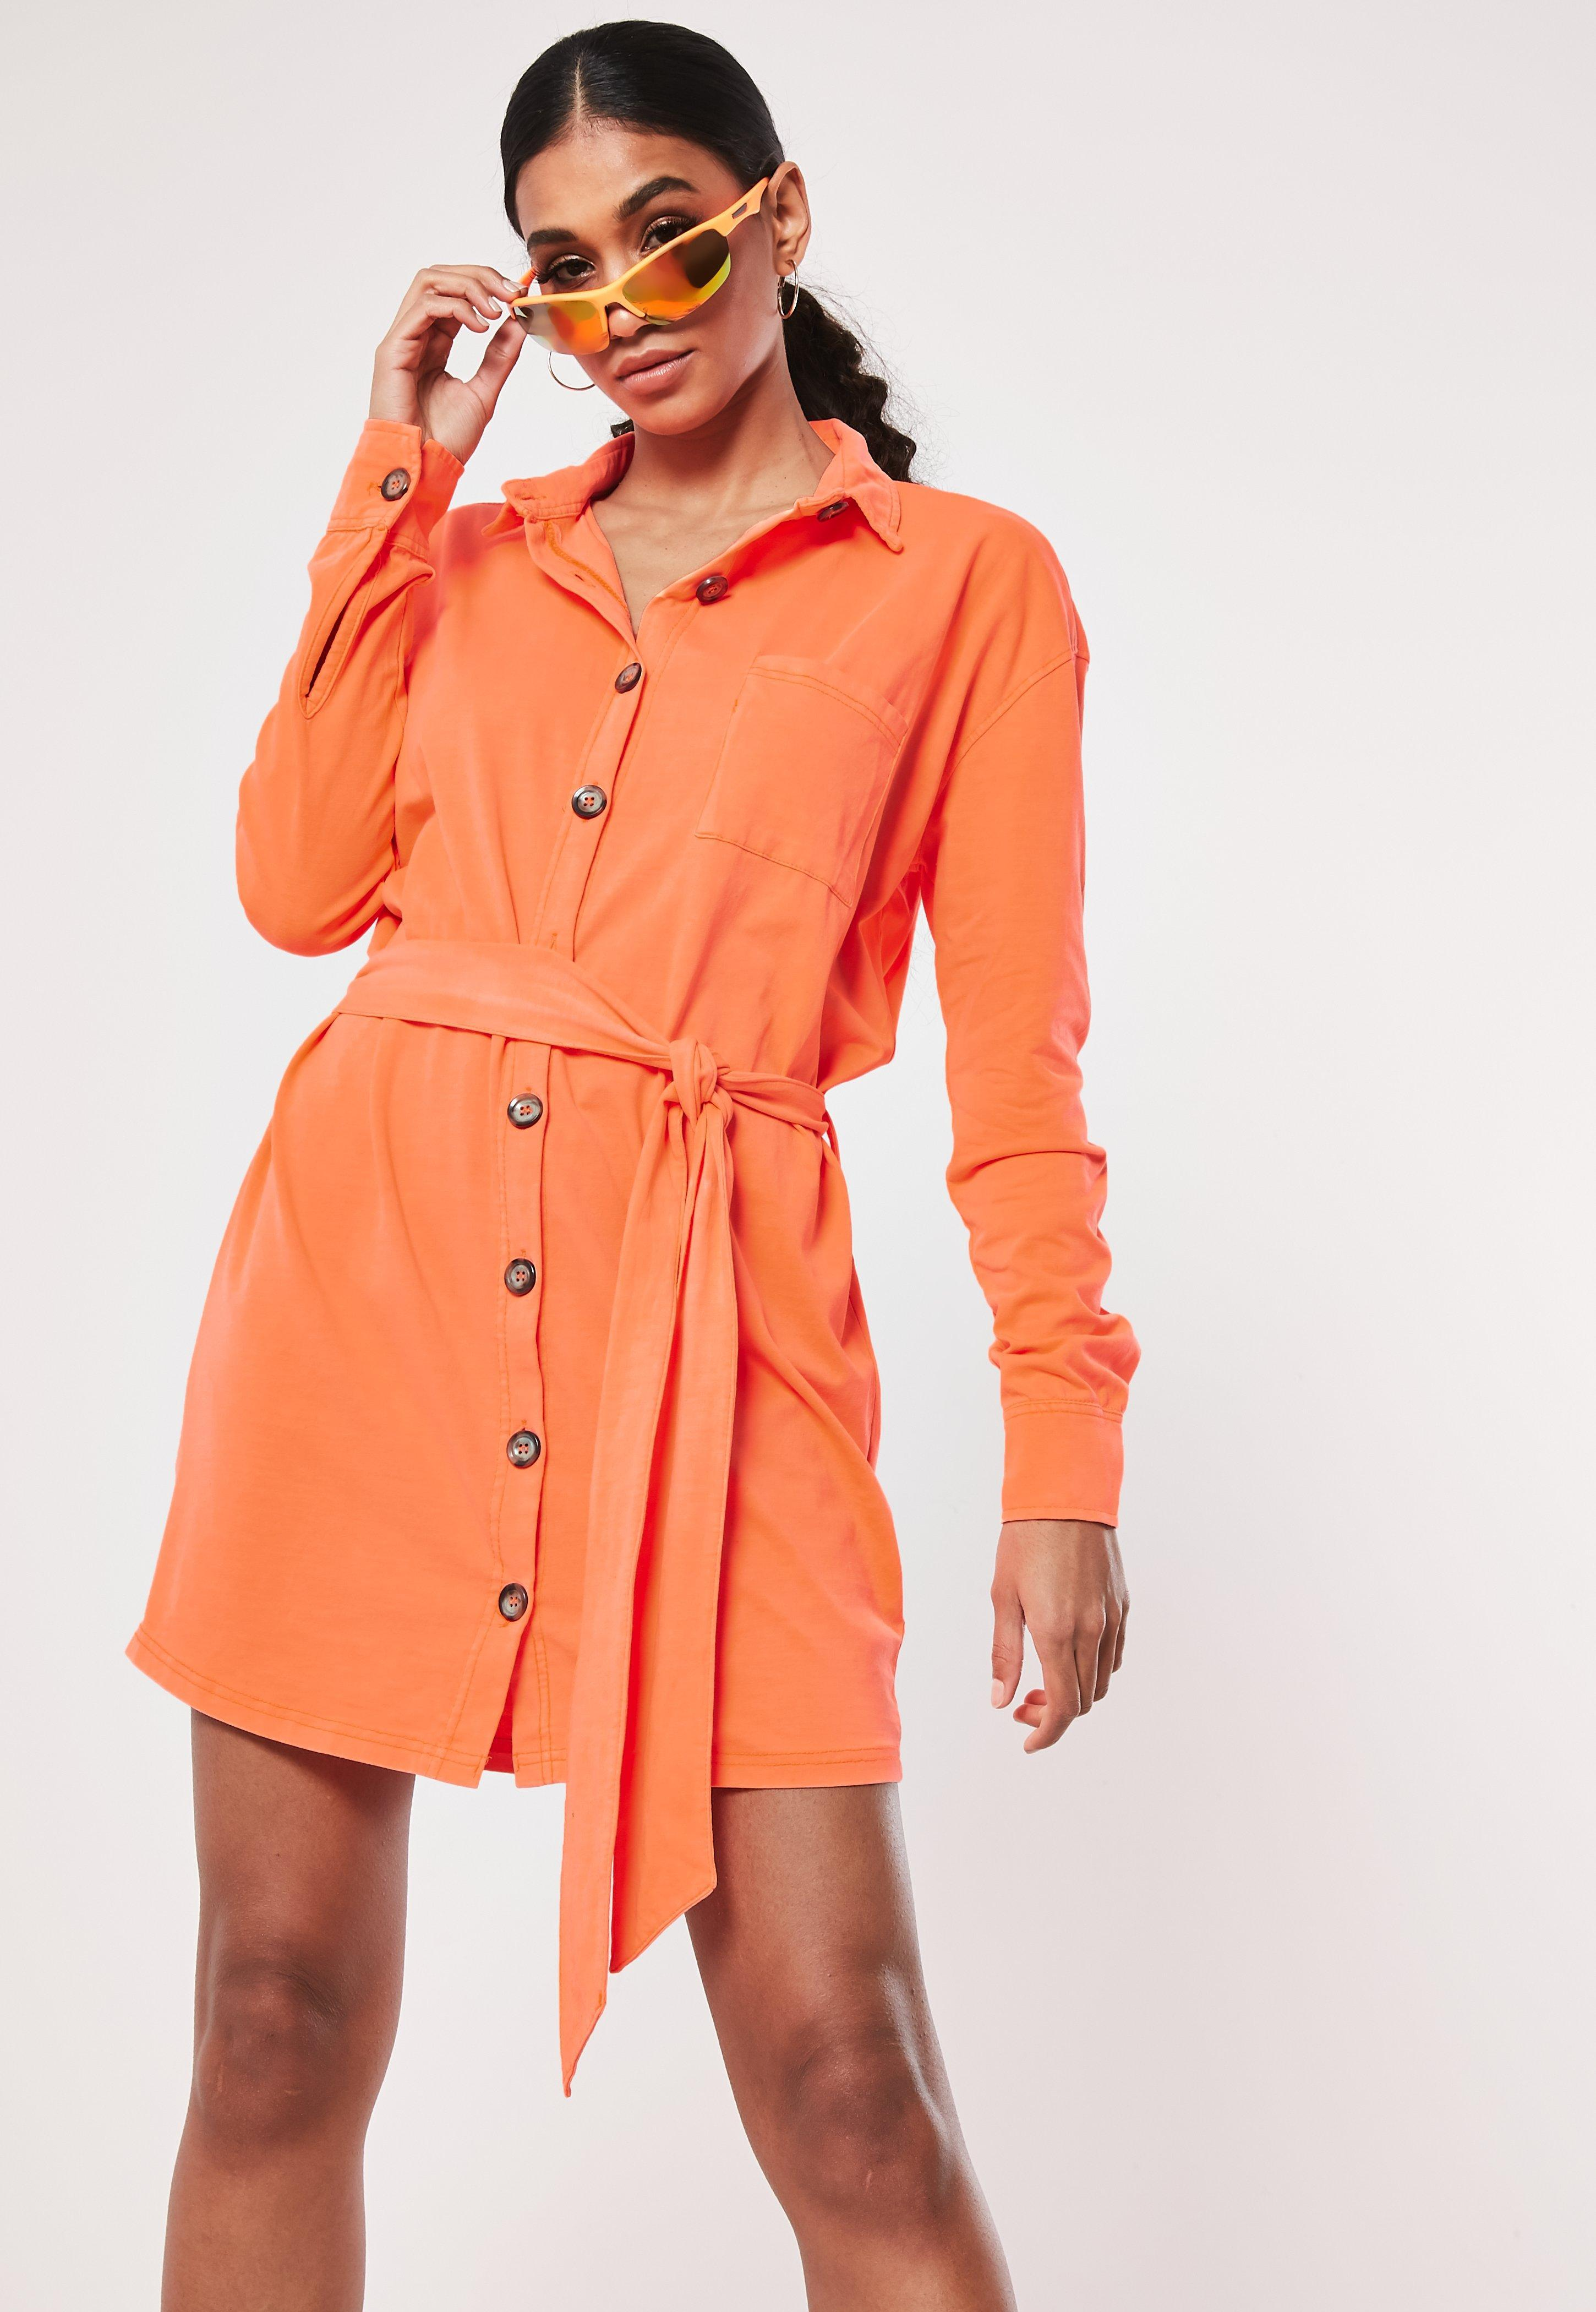 9f91b869e2 Lyst - Missguided Neon Orange Jersey Tie Waist Utility Shirt Dress ...